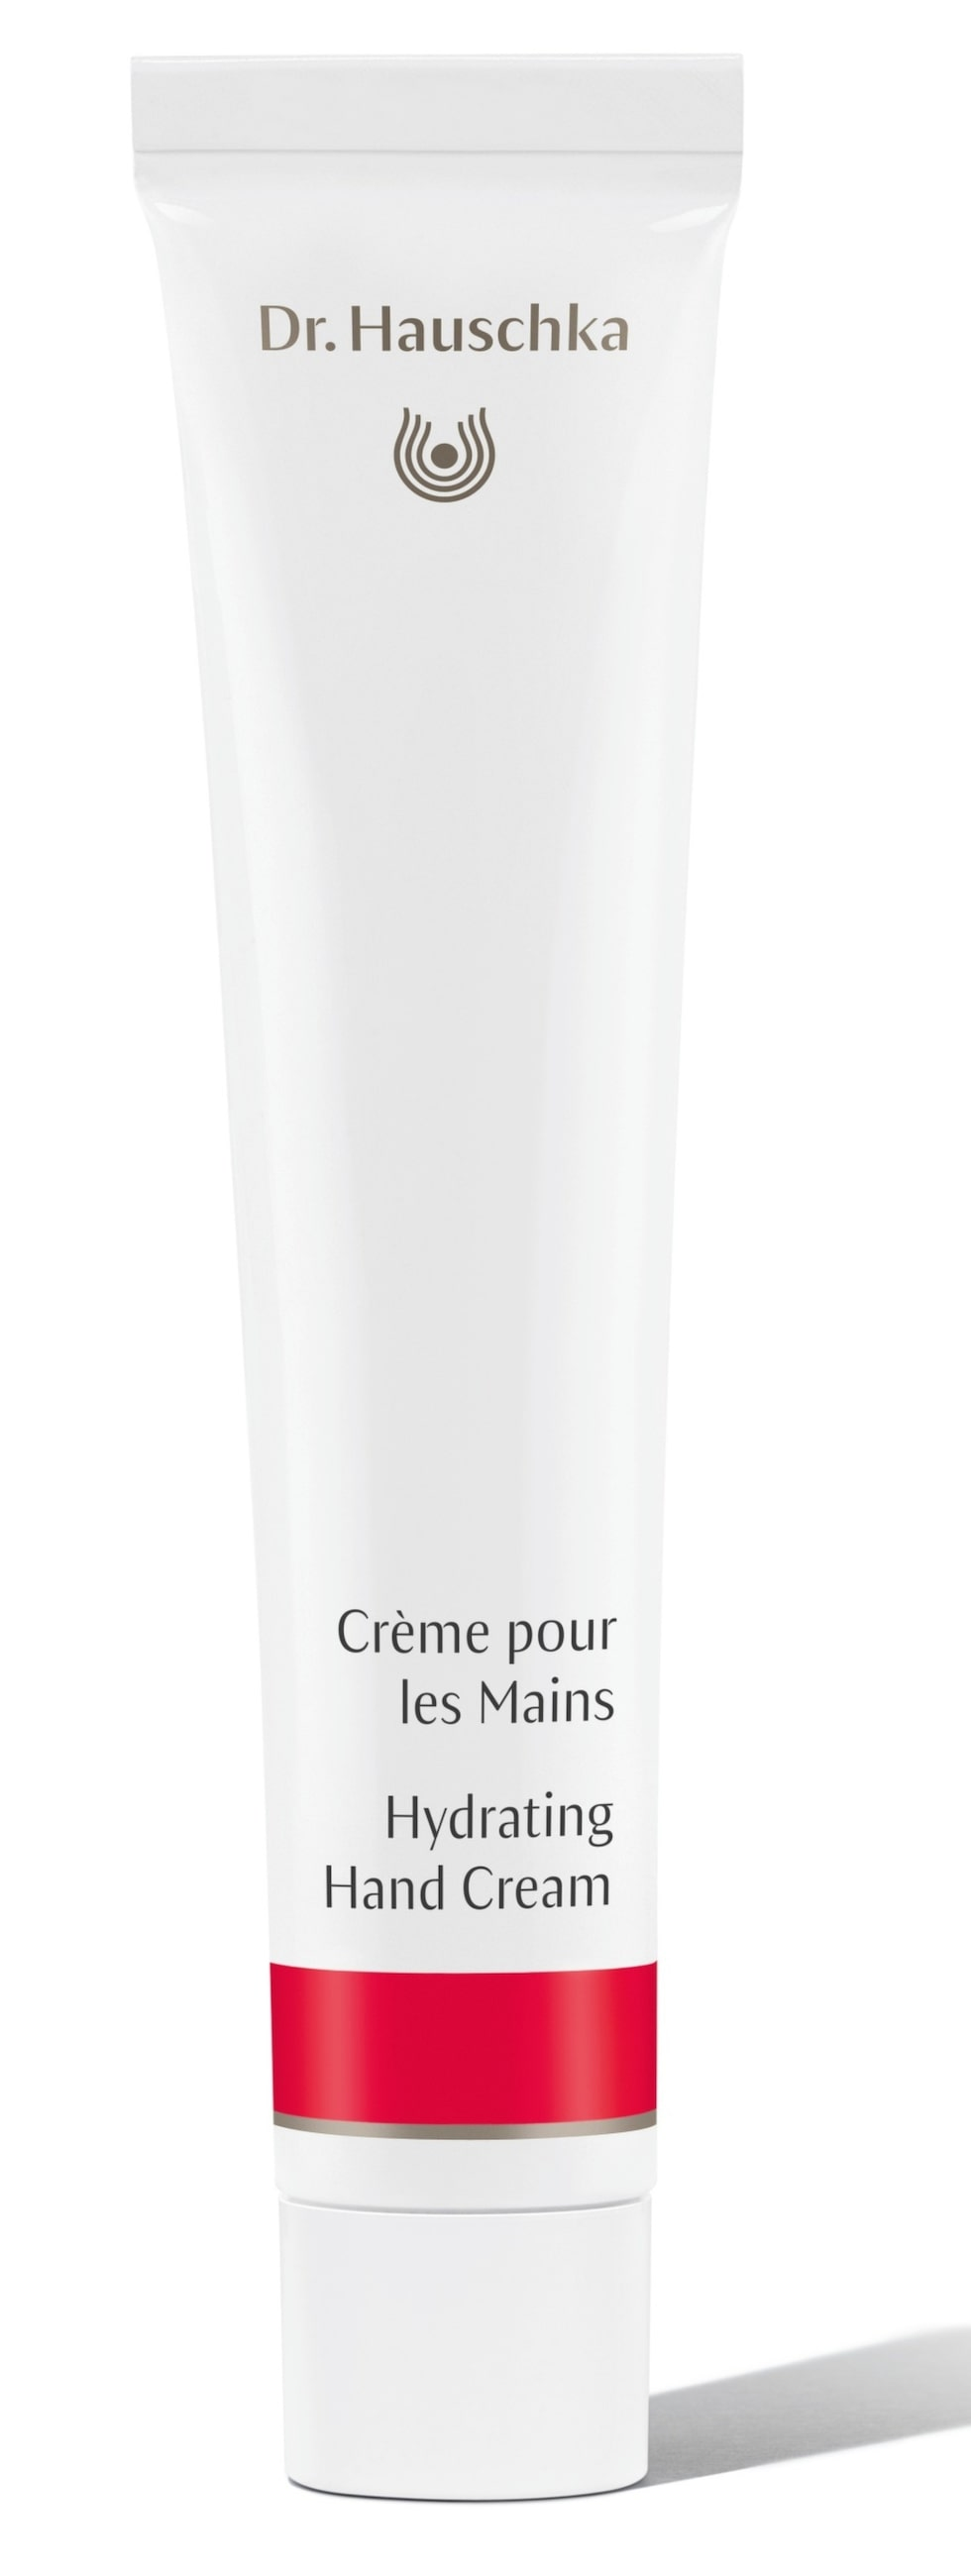 Hydrating hand creme, 93 kronor/50 ml, Dr Hauschka, apotea.se